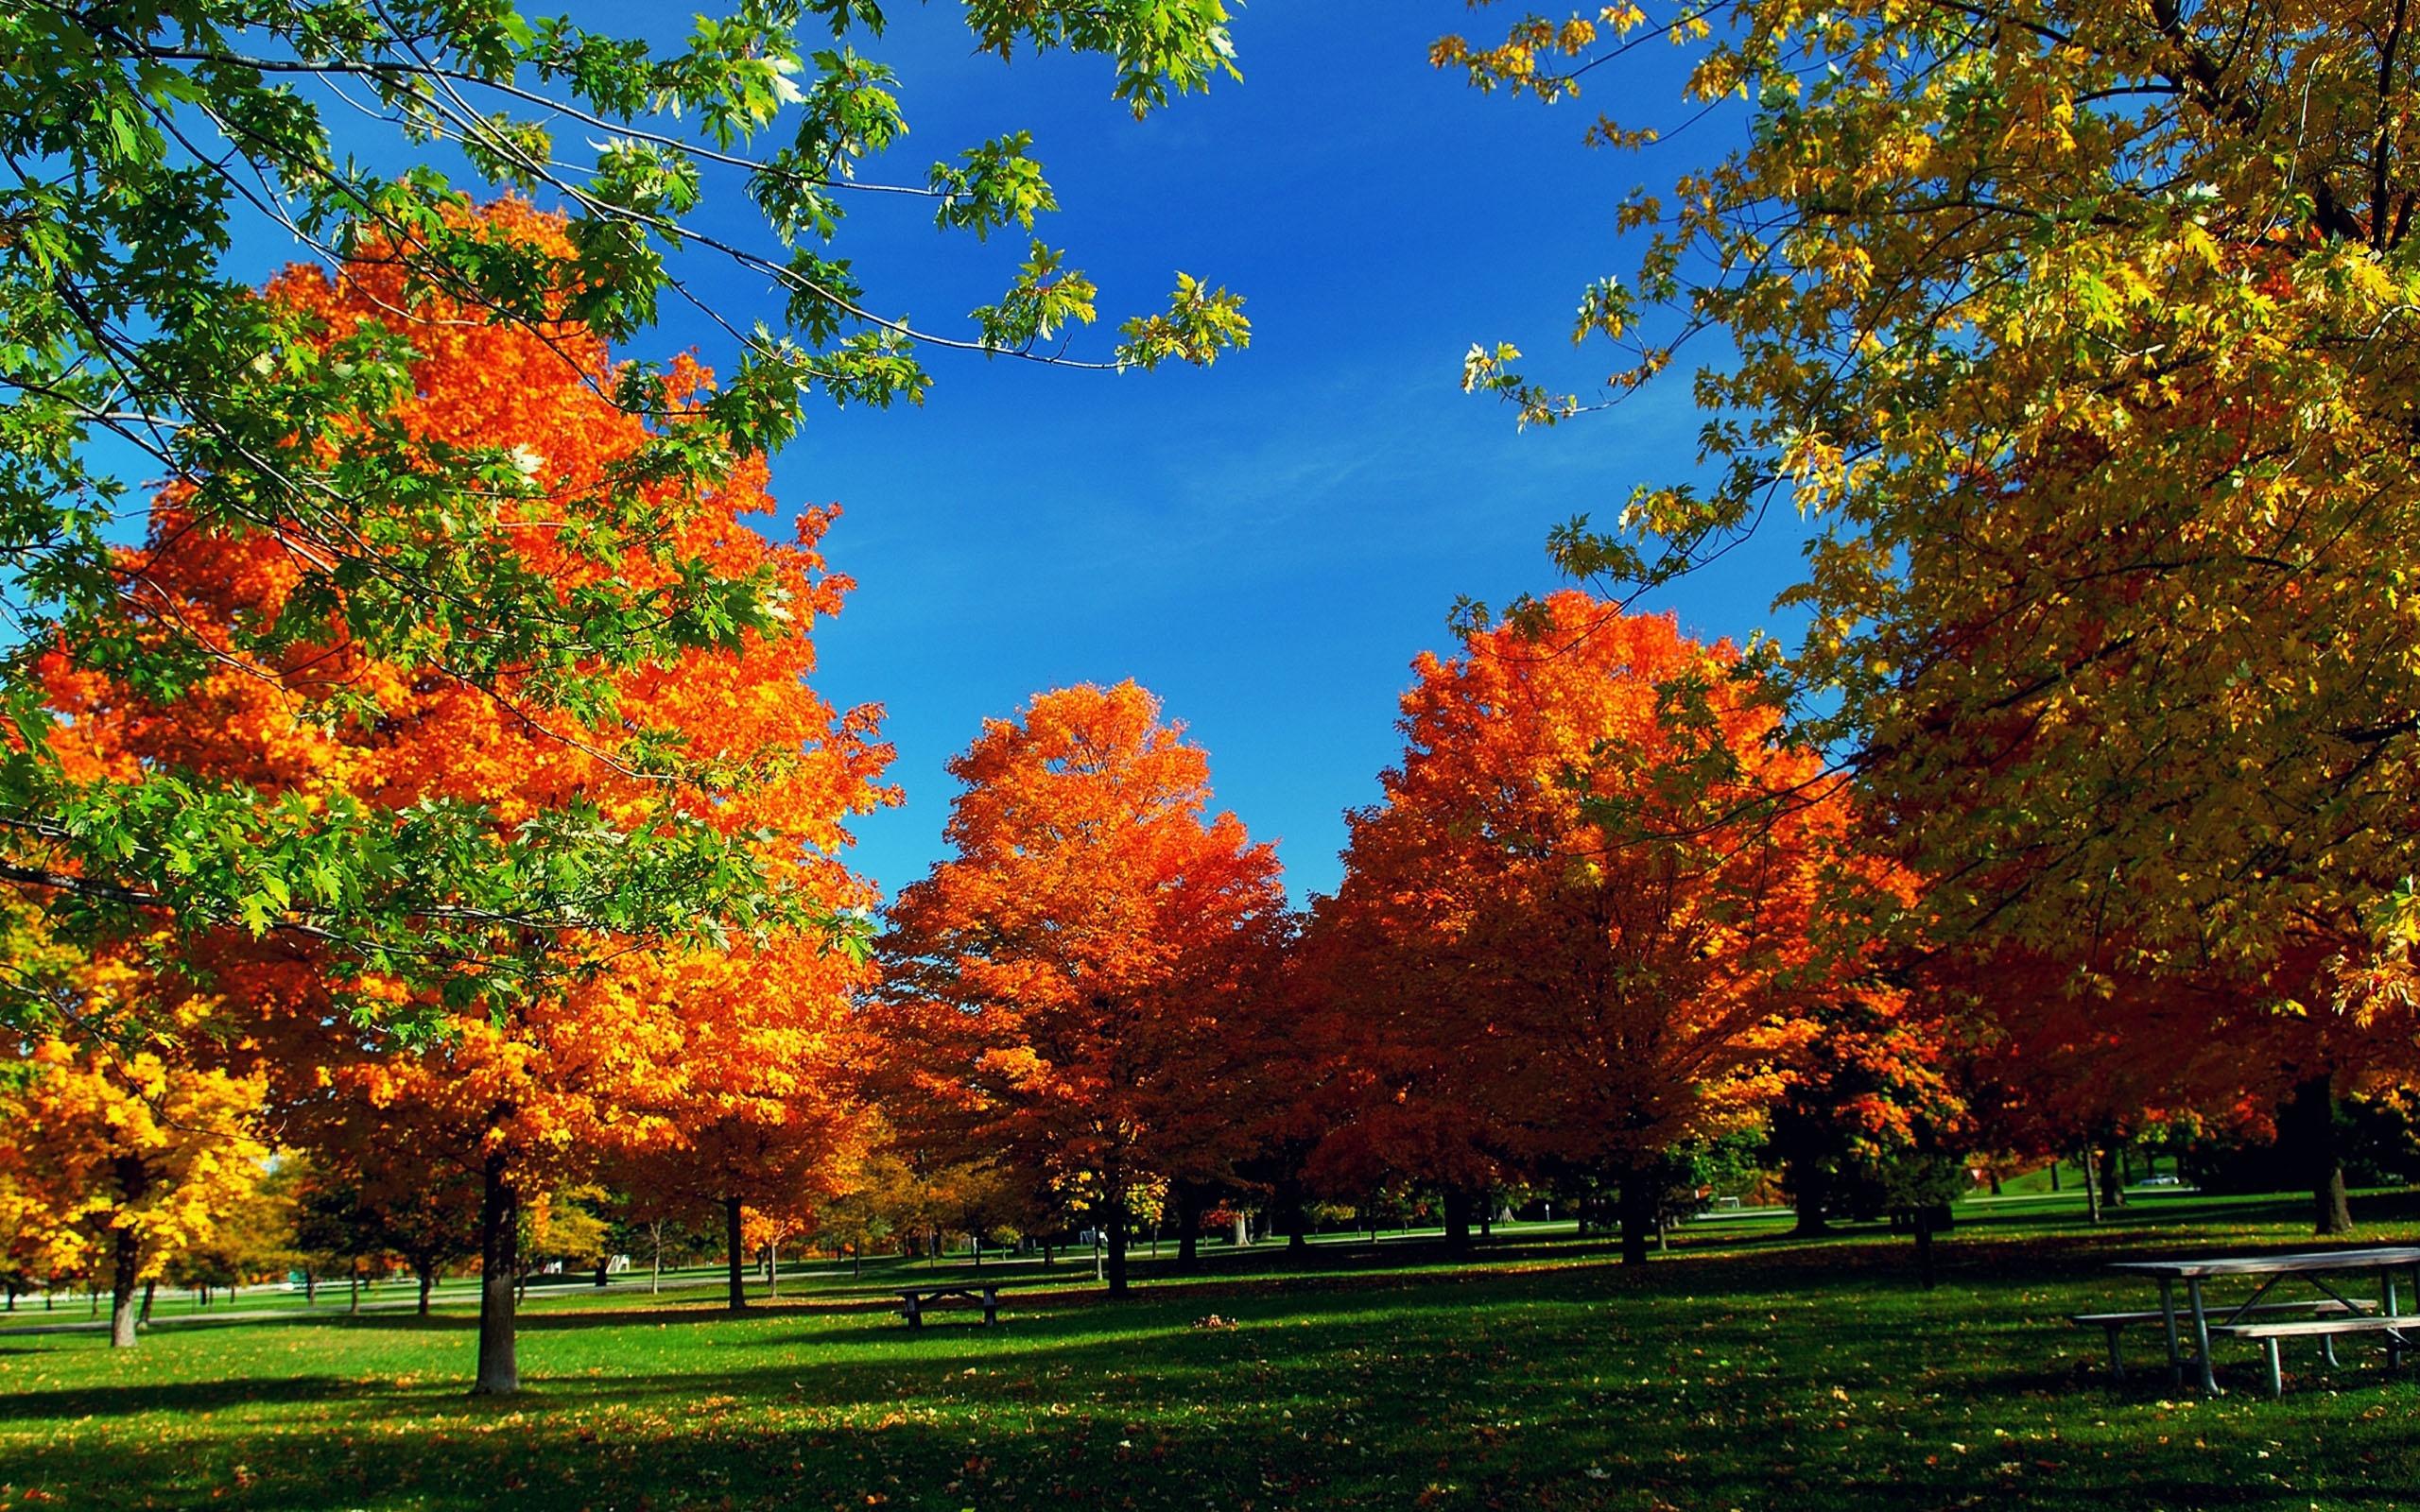 66 autumn wallpaper widescreen Pictures